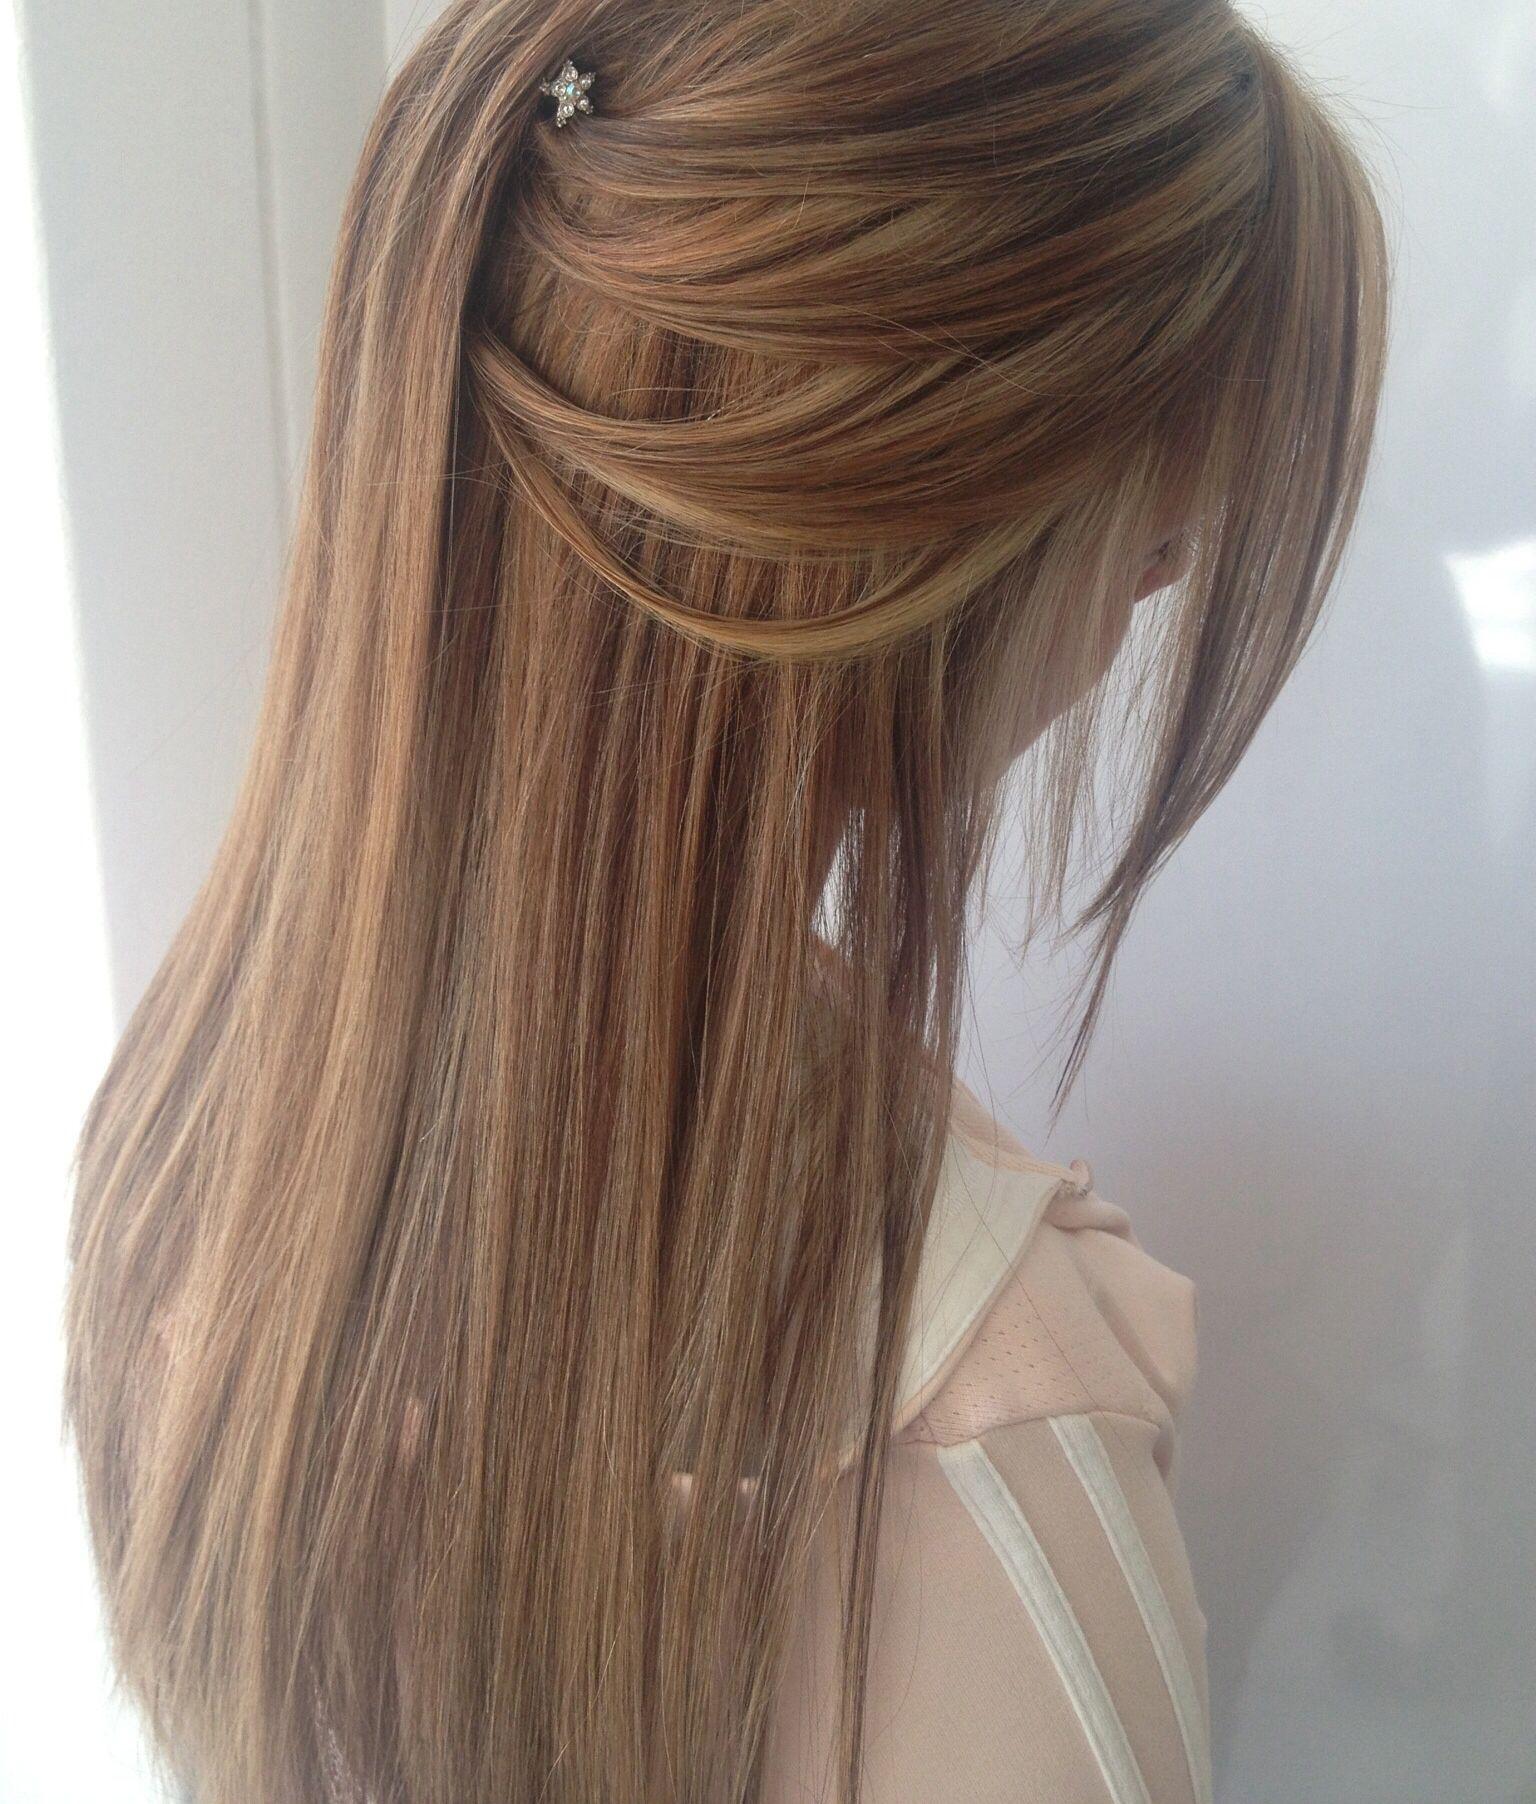 hair ideas for the matric dance. half up half down long hair